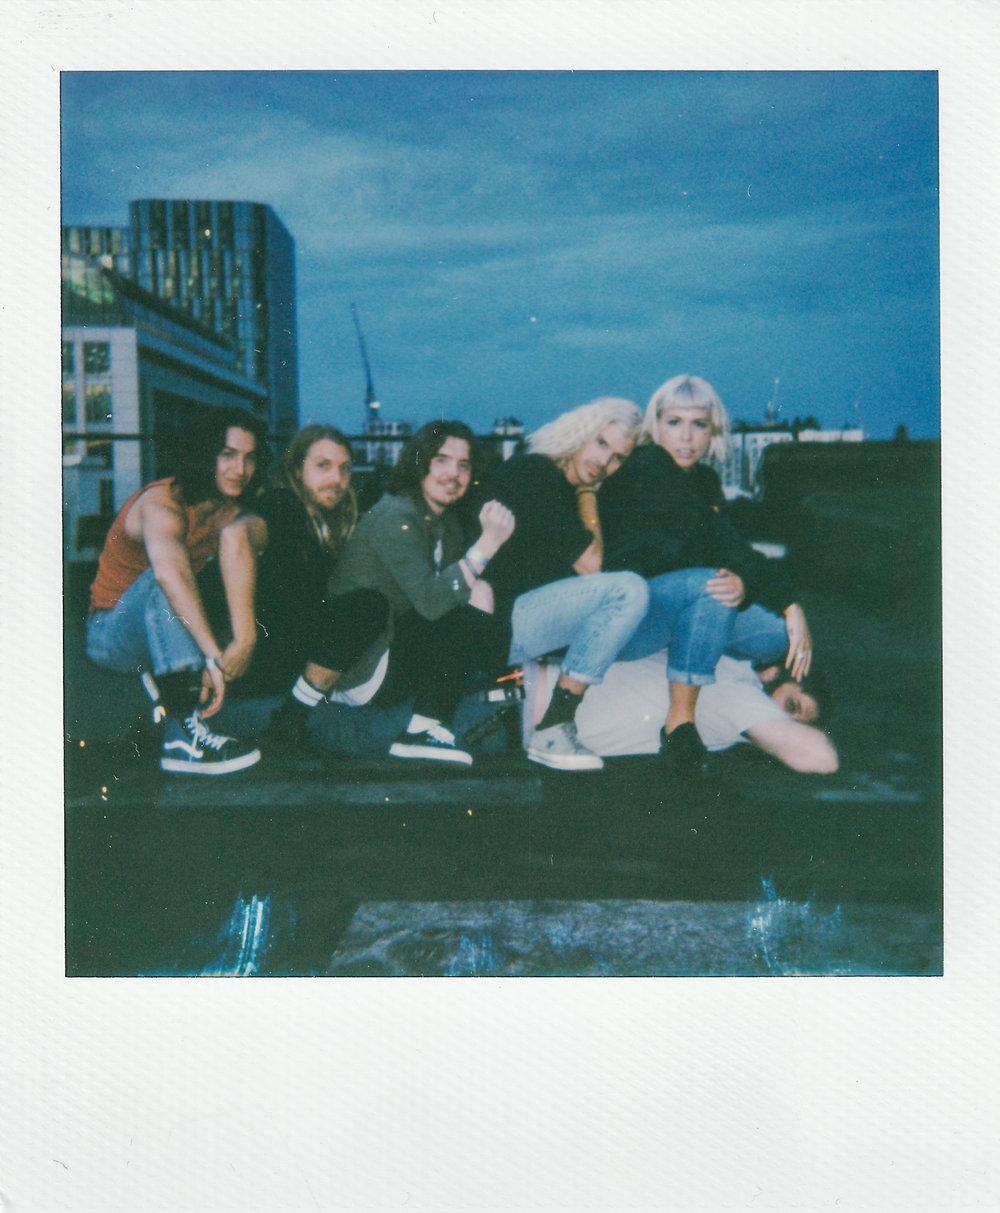 Grouplove - Polaroids - 23.08.2017-3.jpg